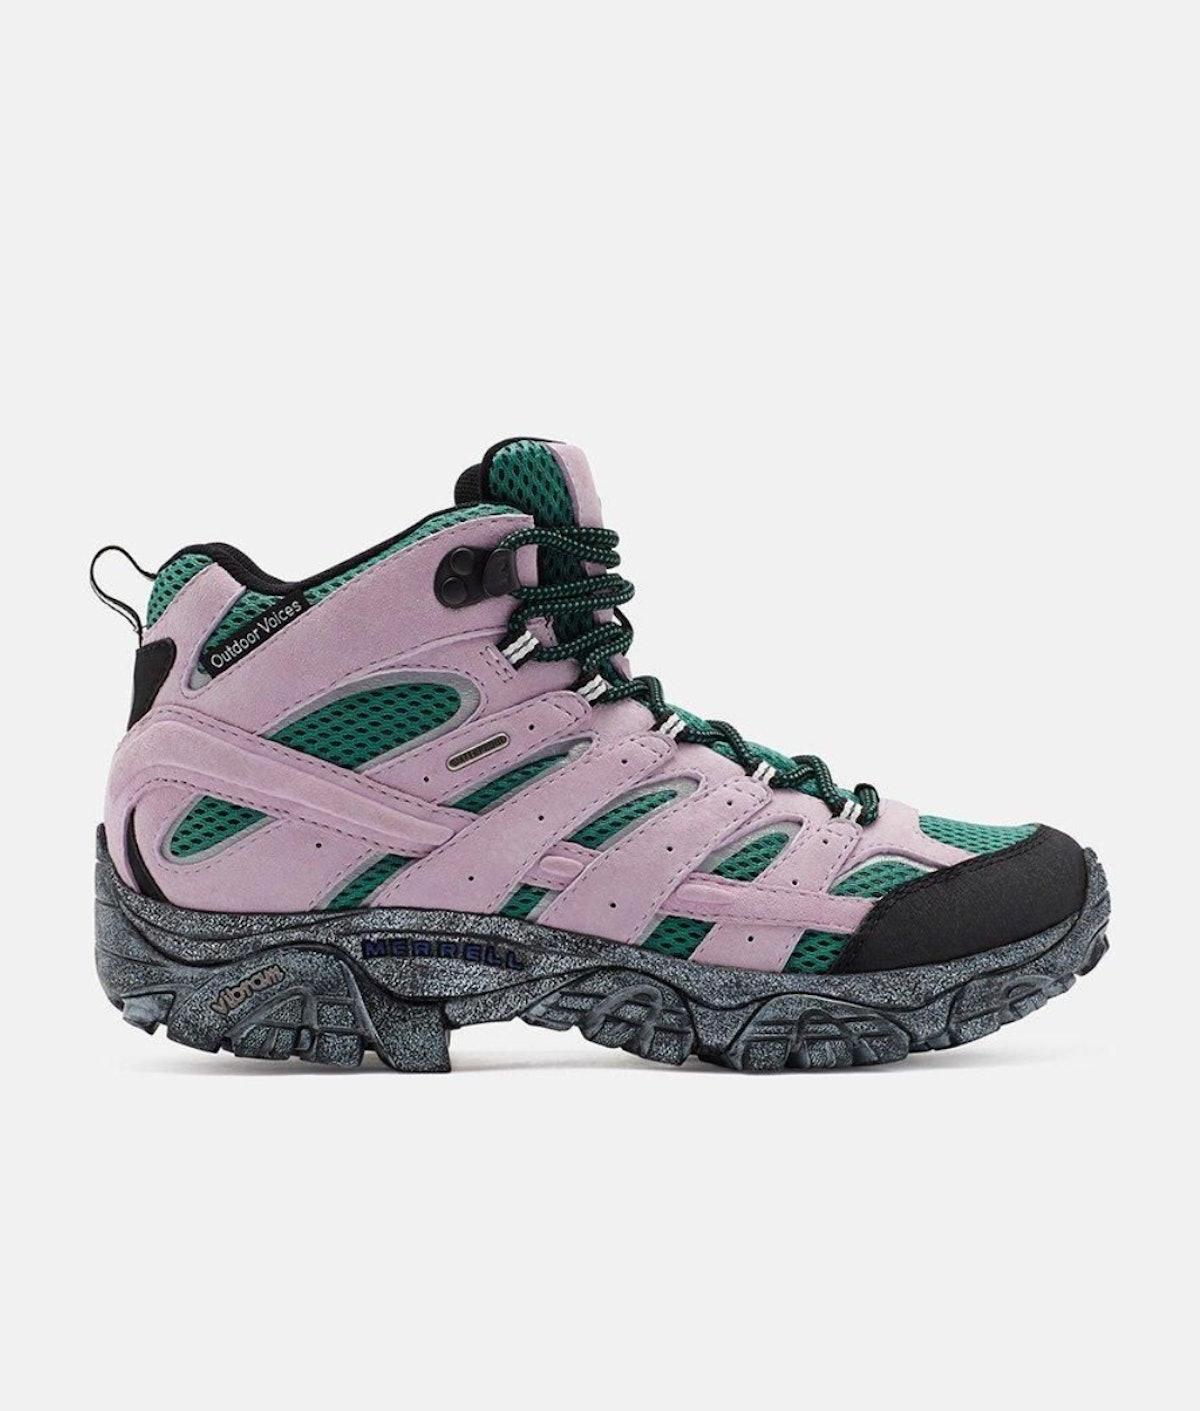 Moab Hiking Boots